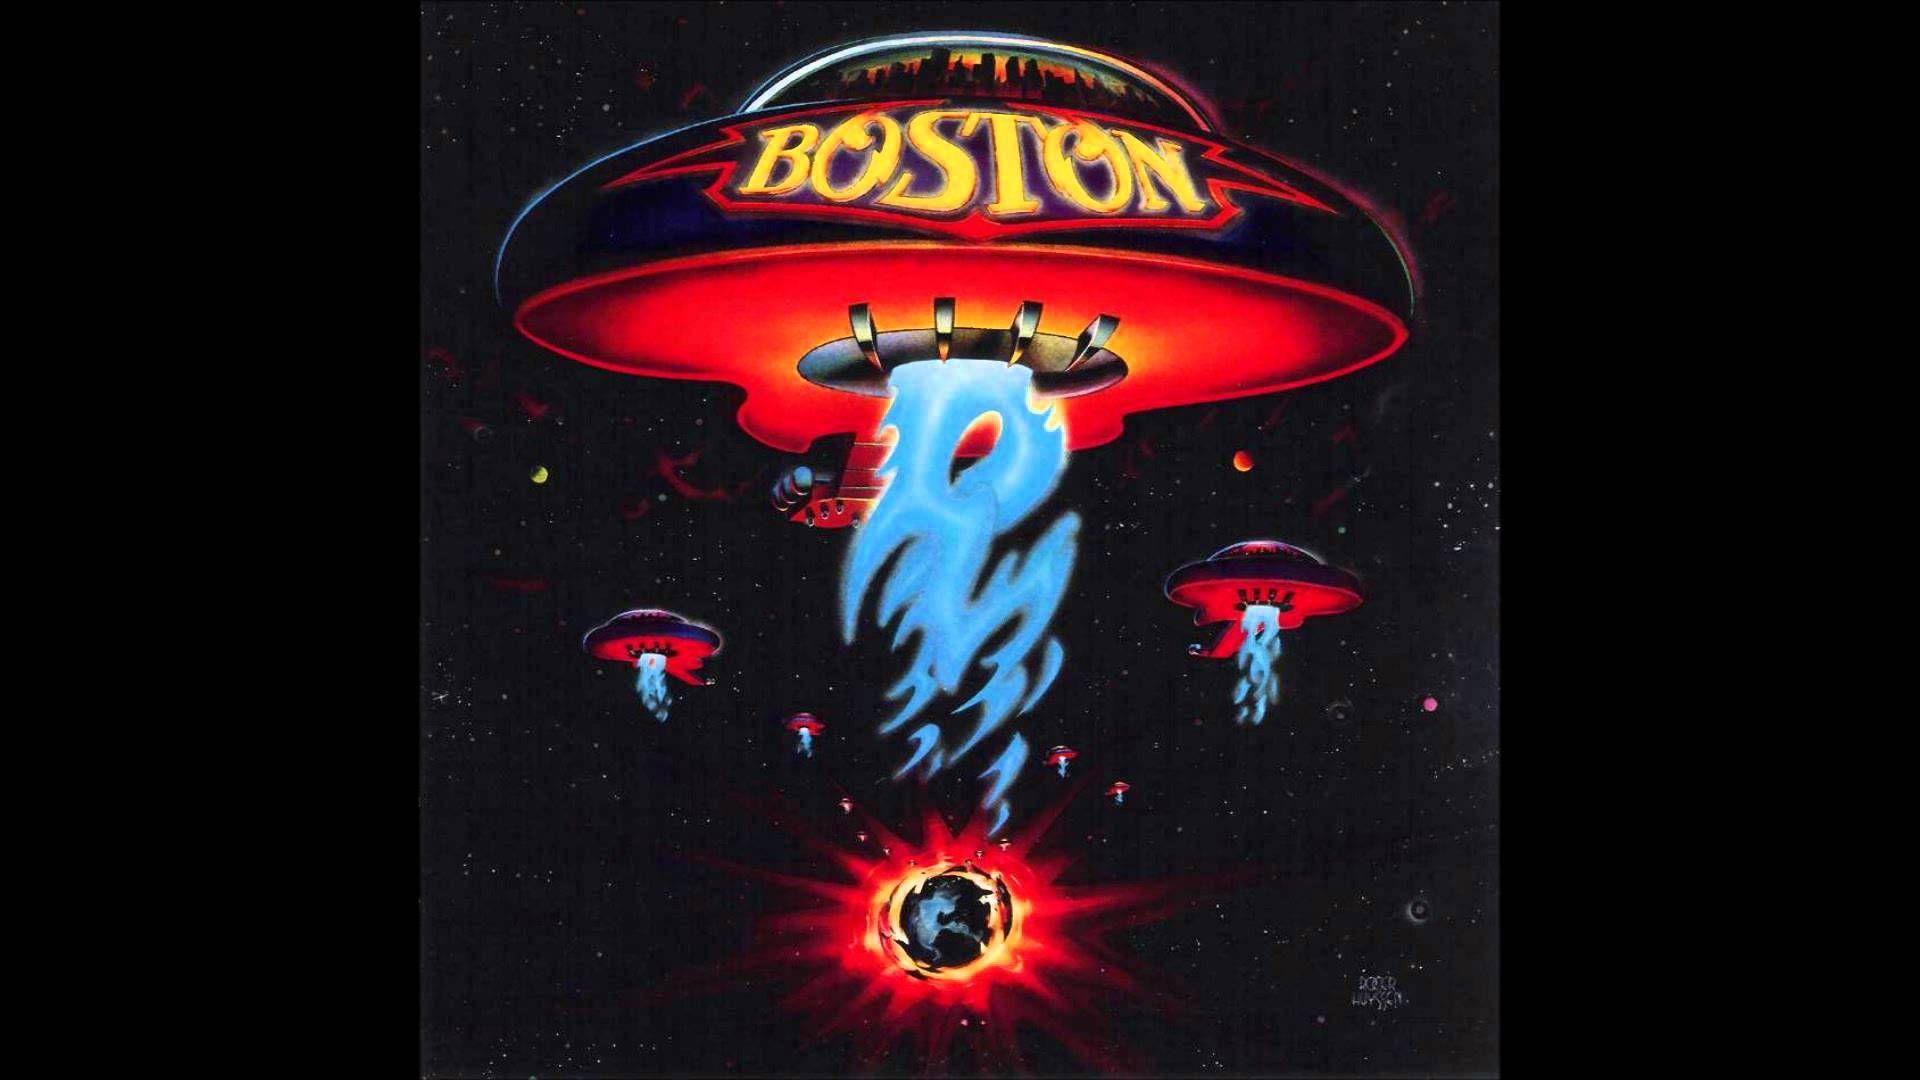 Boston More Than A Feeling Lp Rip Boston Album Best Selling Albums Album Covers